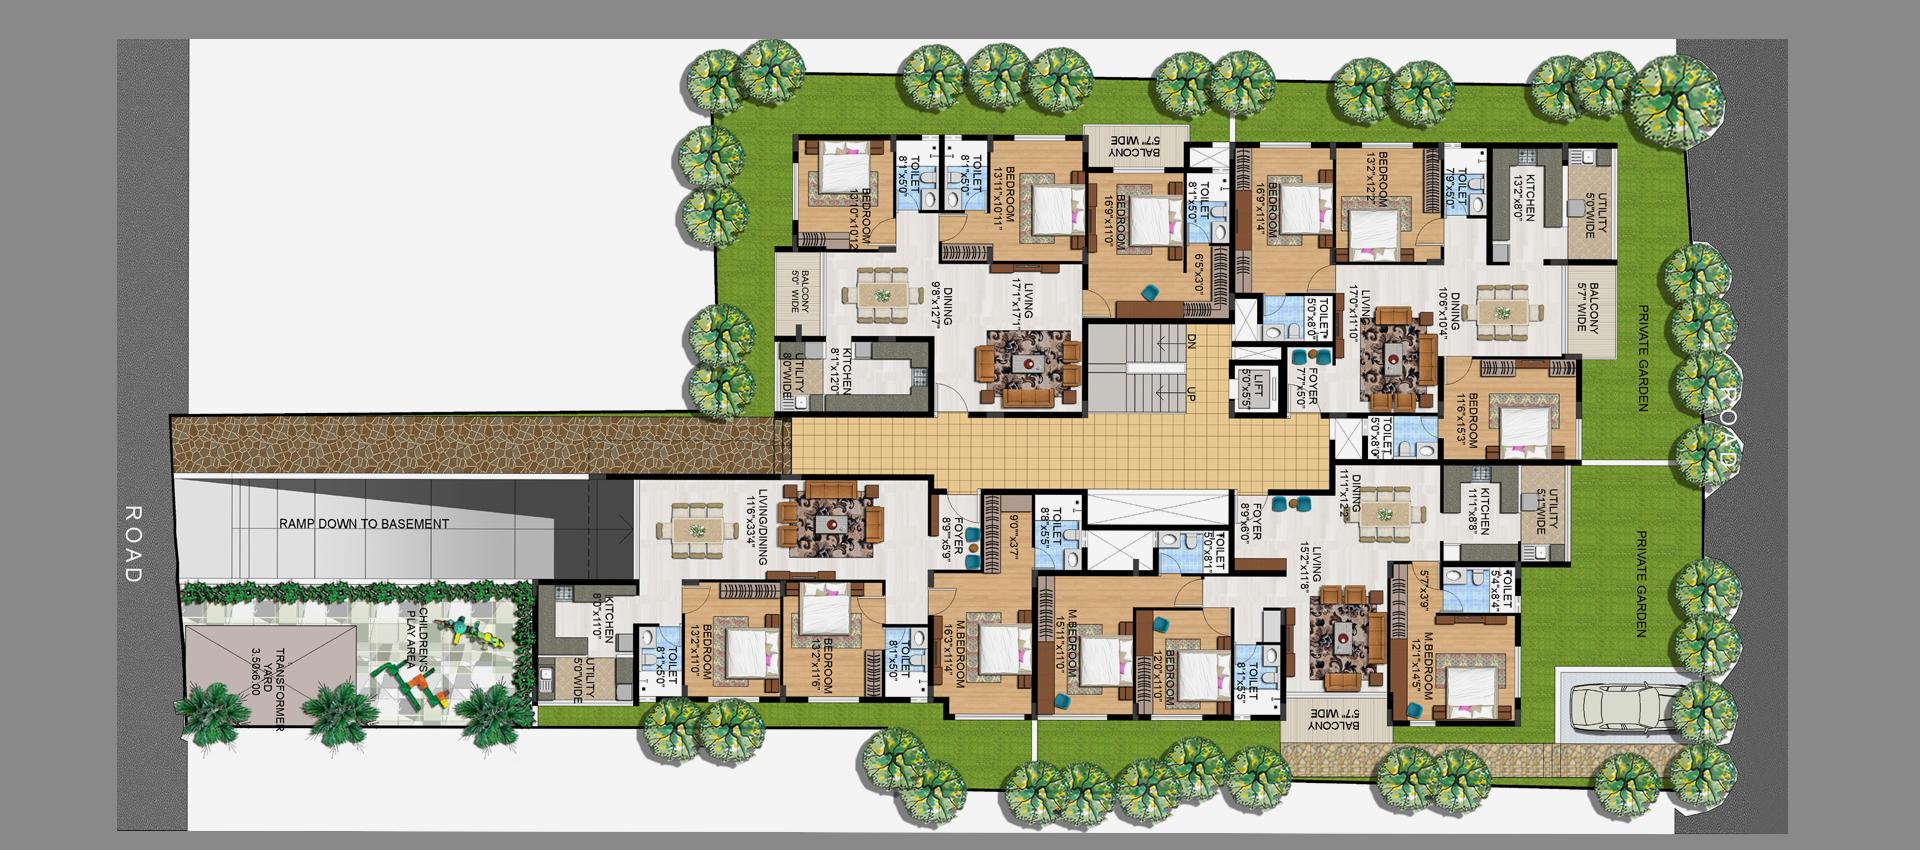 Sunland Ventures_Site Plan_Assara